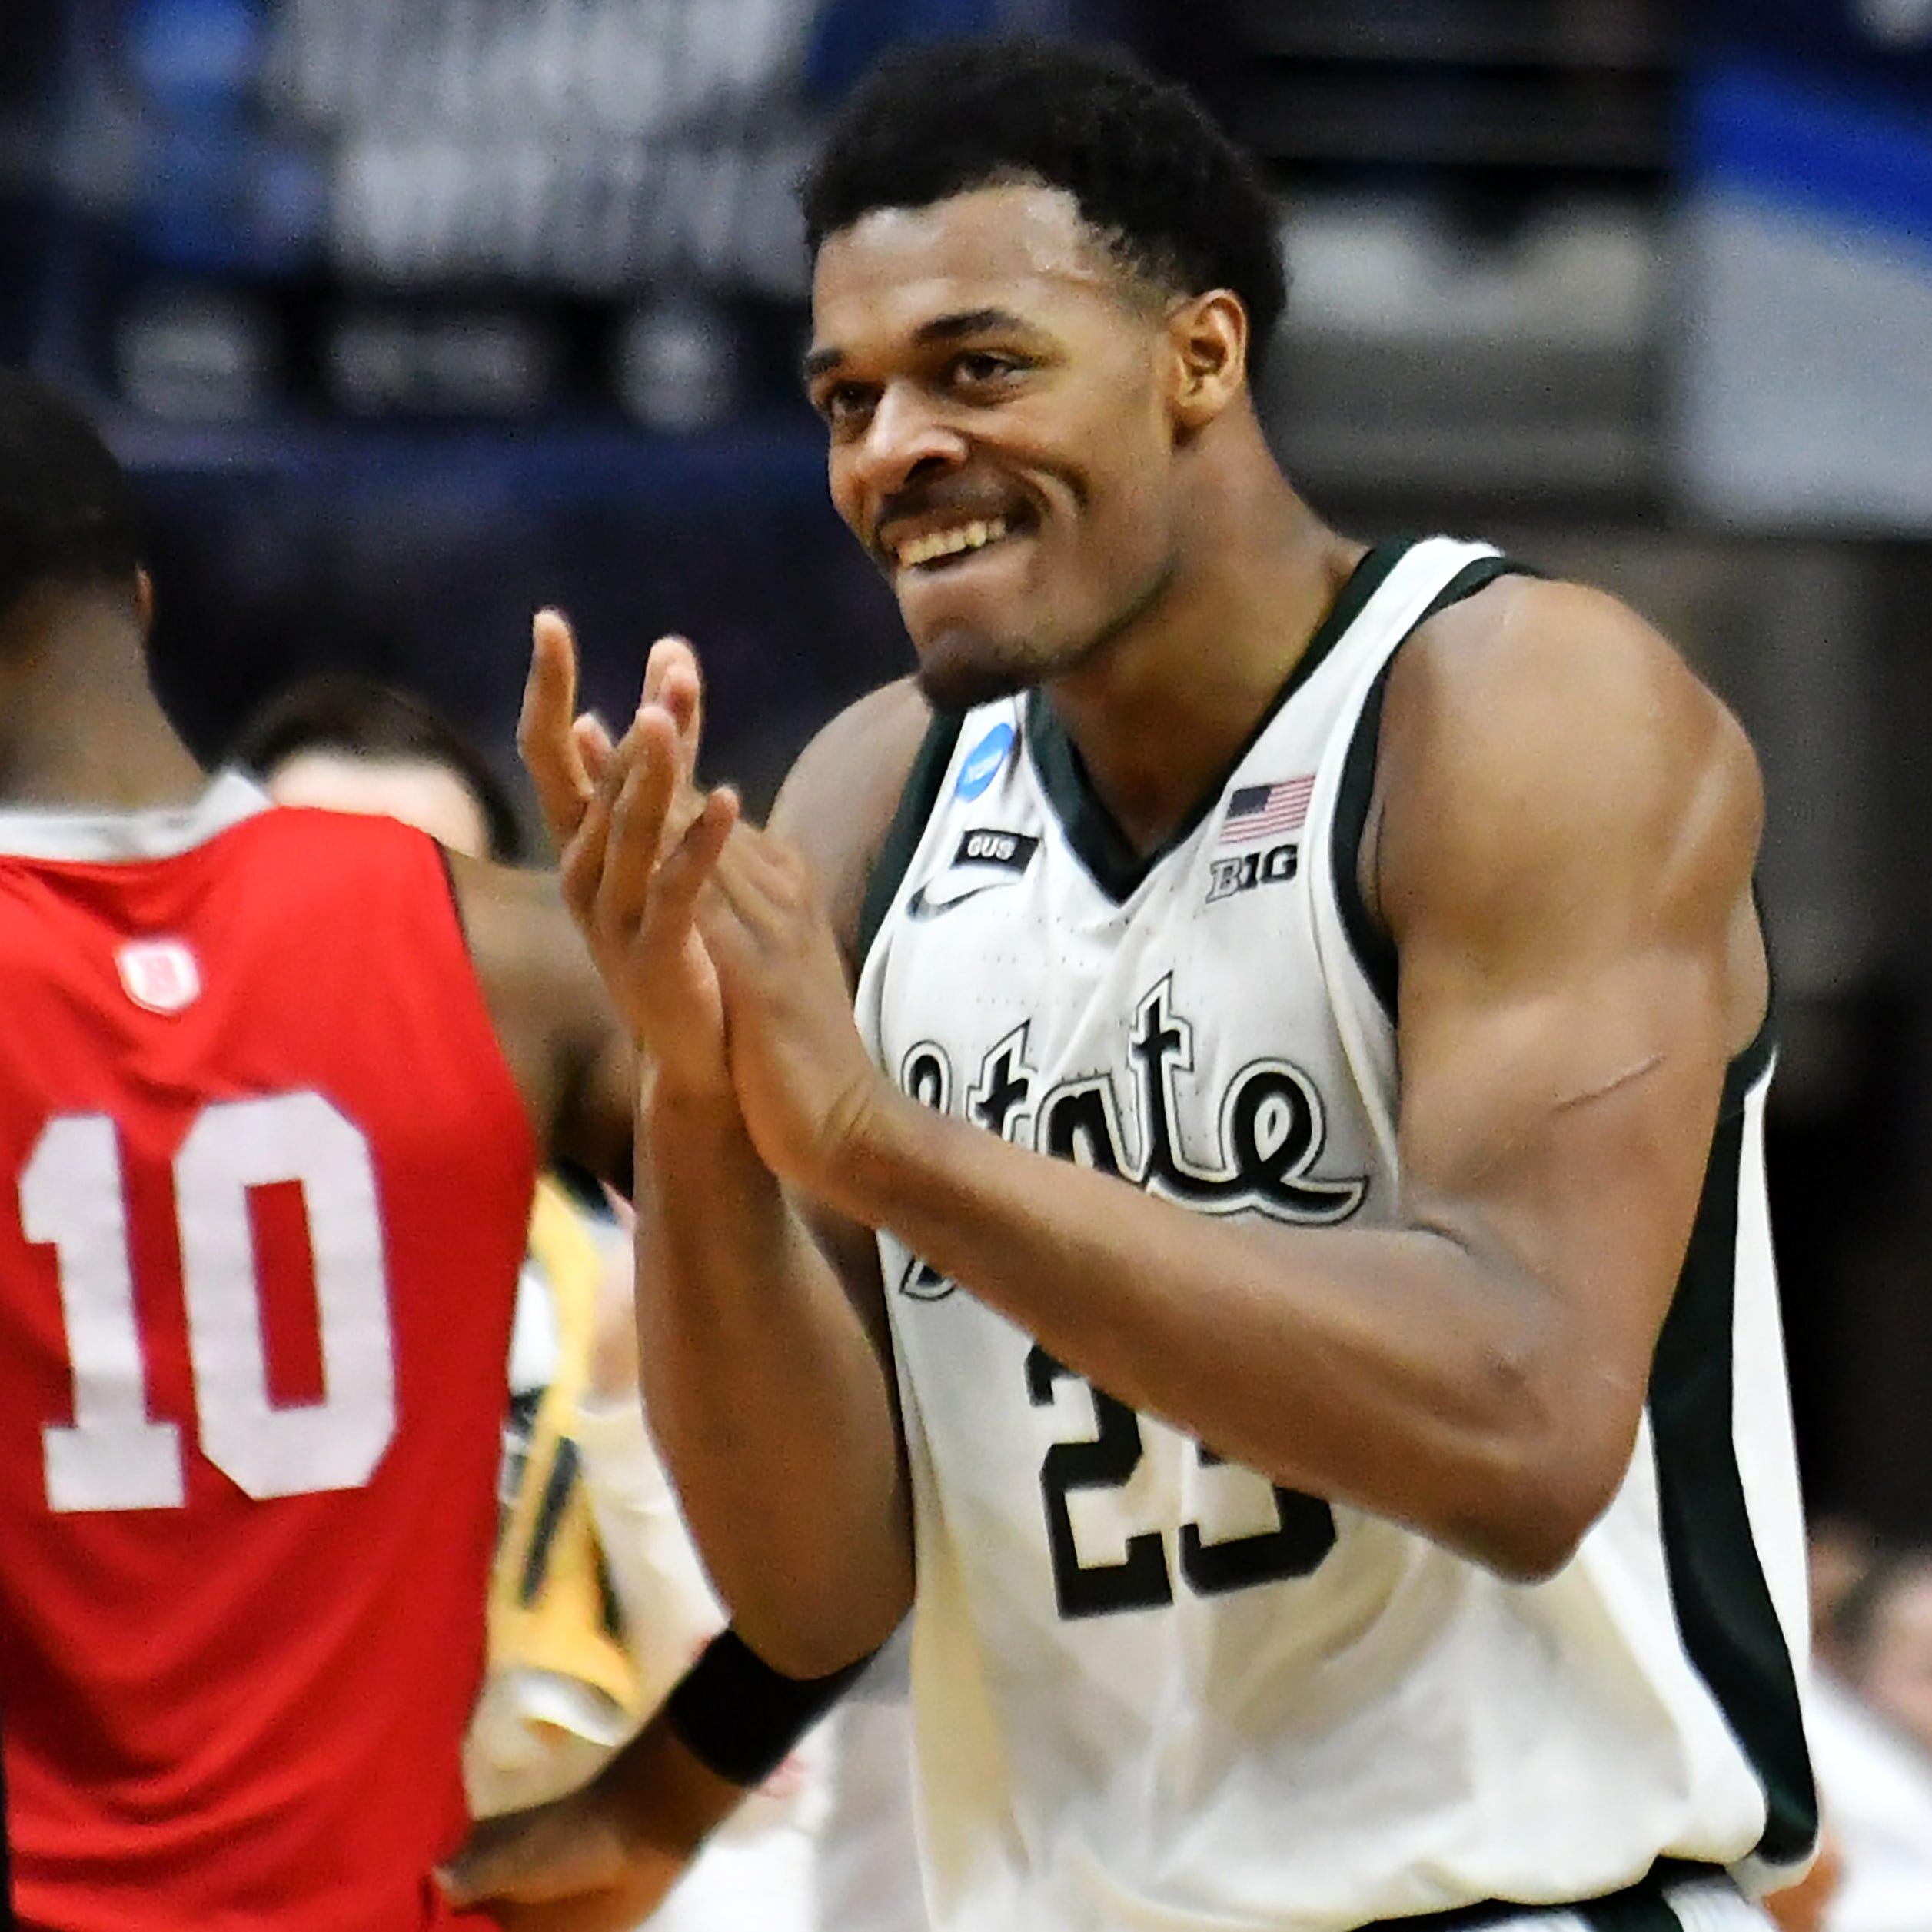 Michigan State tops 'way-too-early' basketball rankings; Michigan in top 10